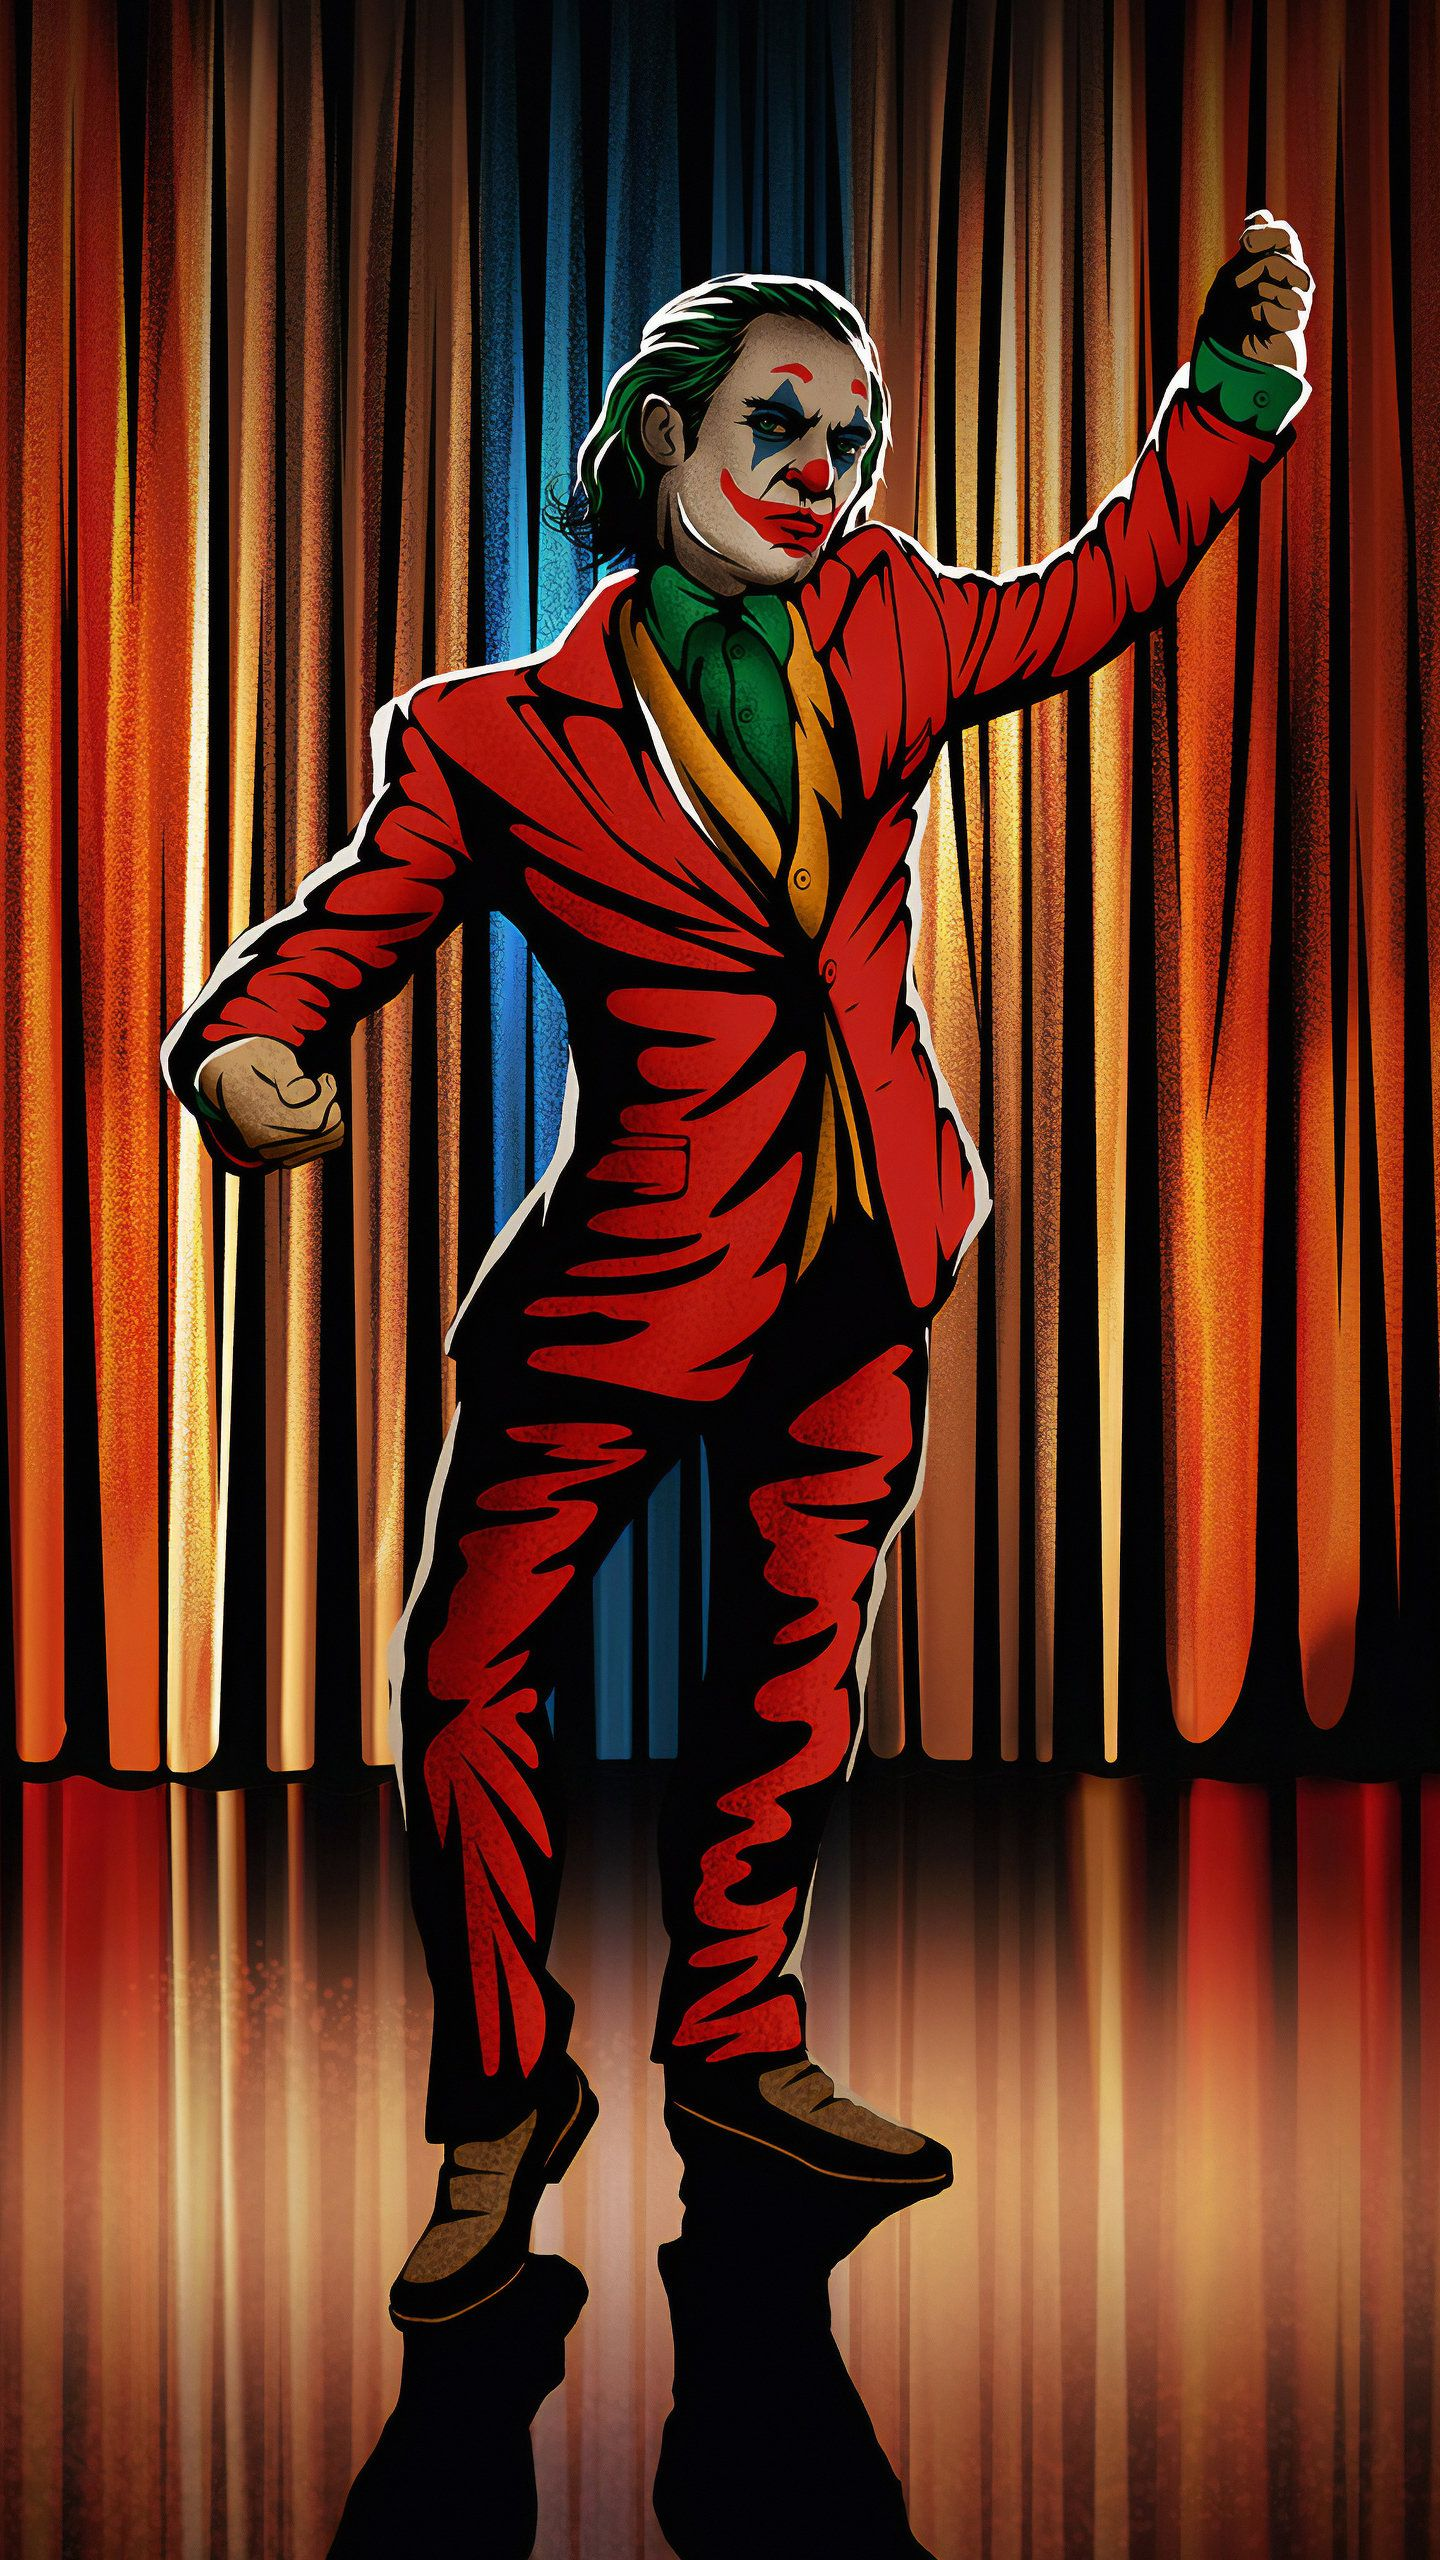 Joker Dancing Hd Superheroes Wallpapers Photos And Pictures